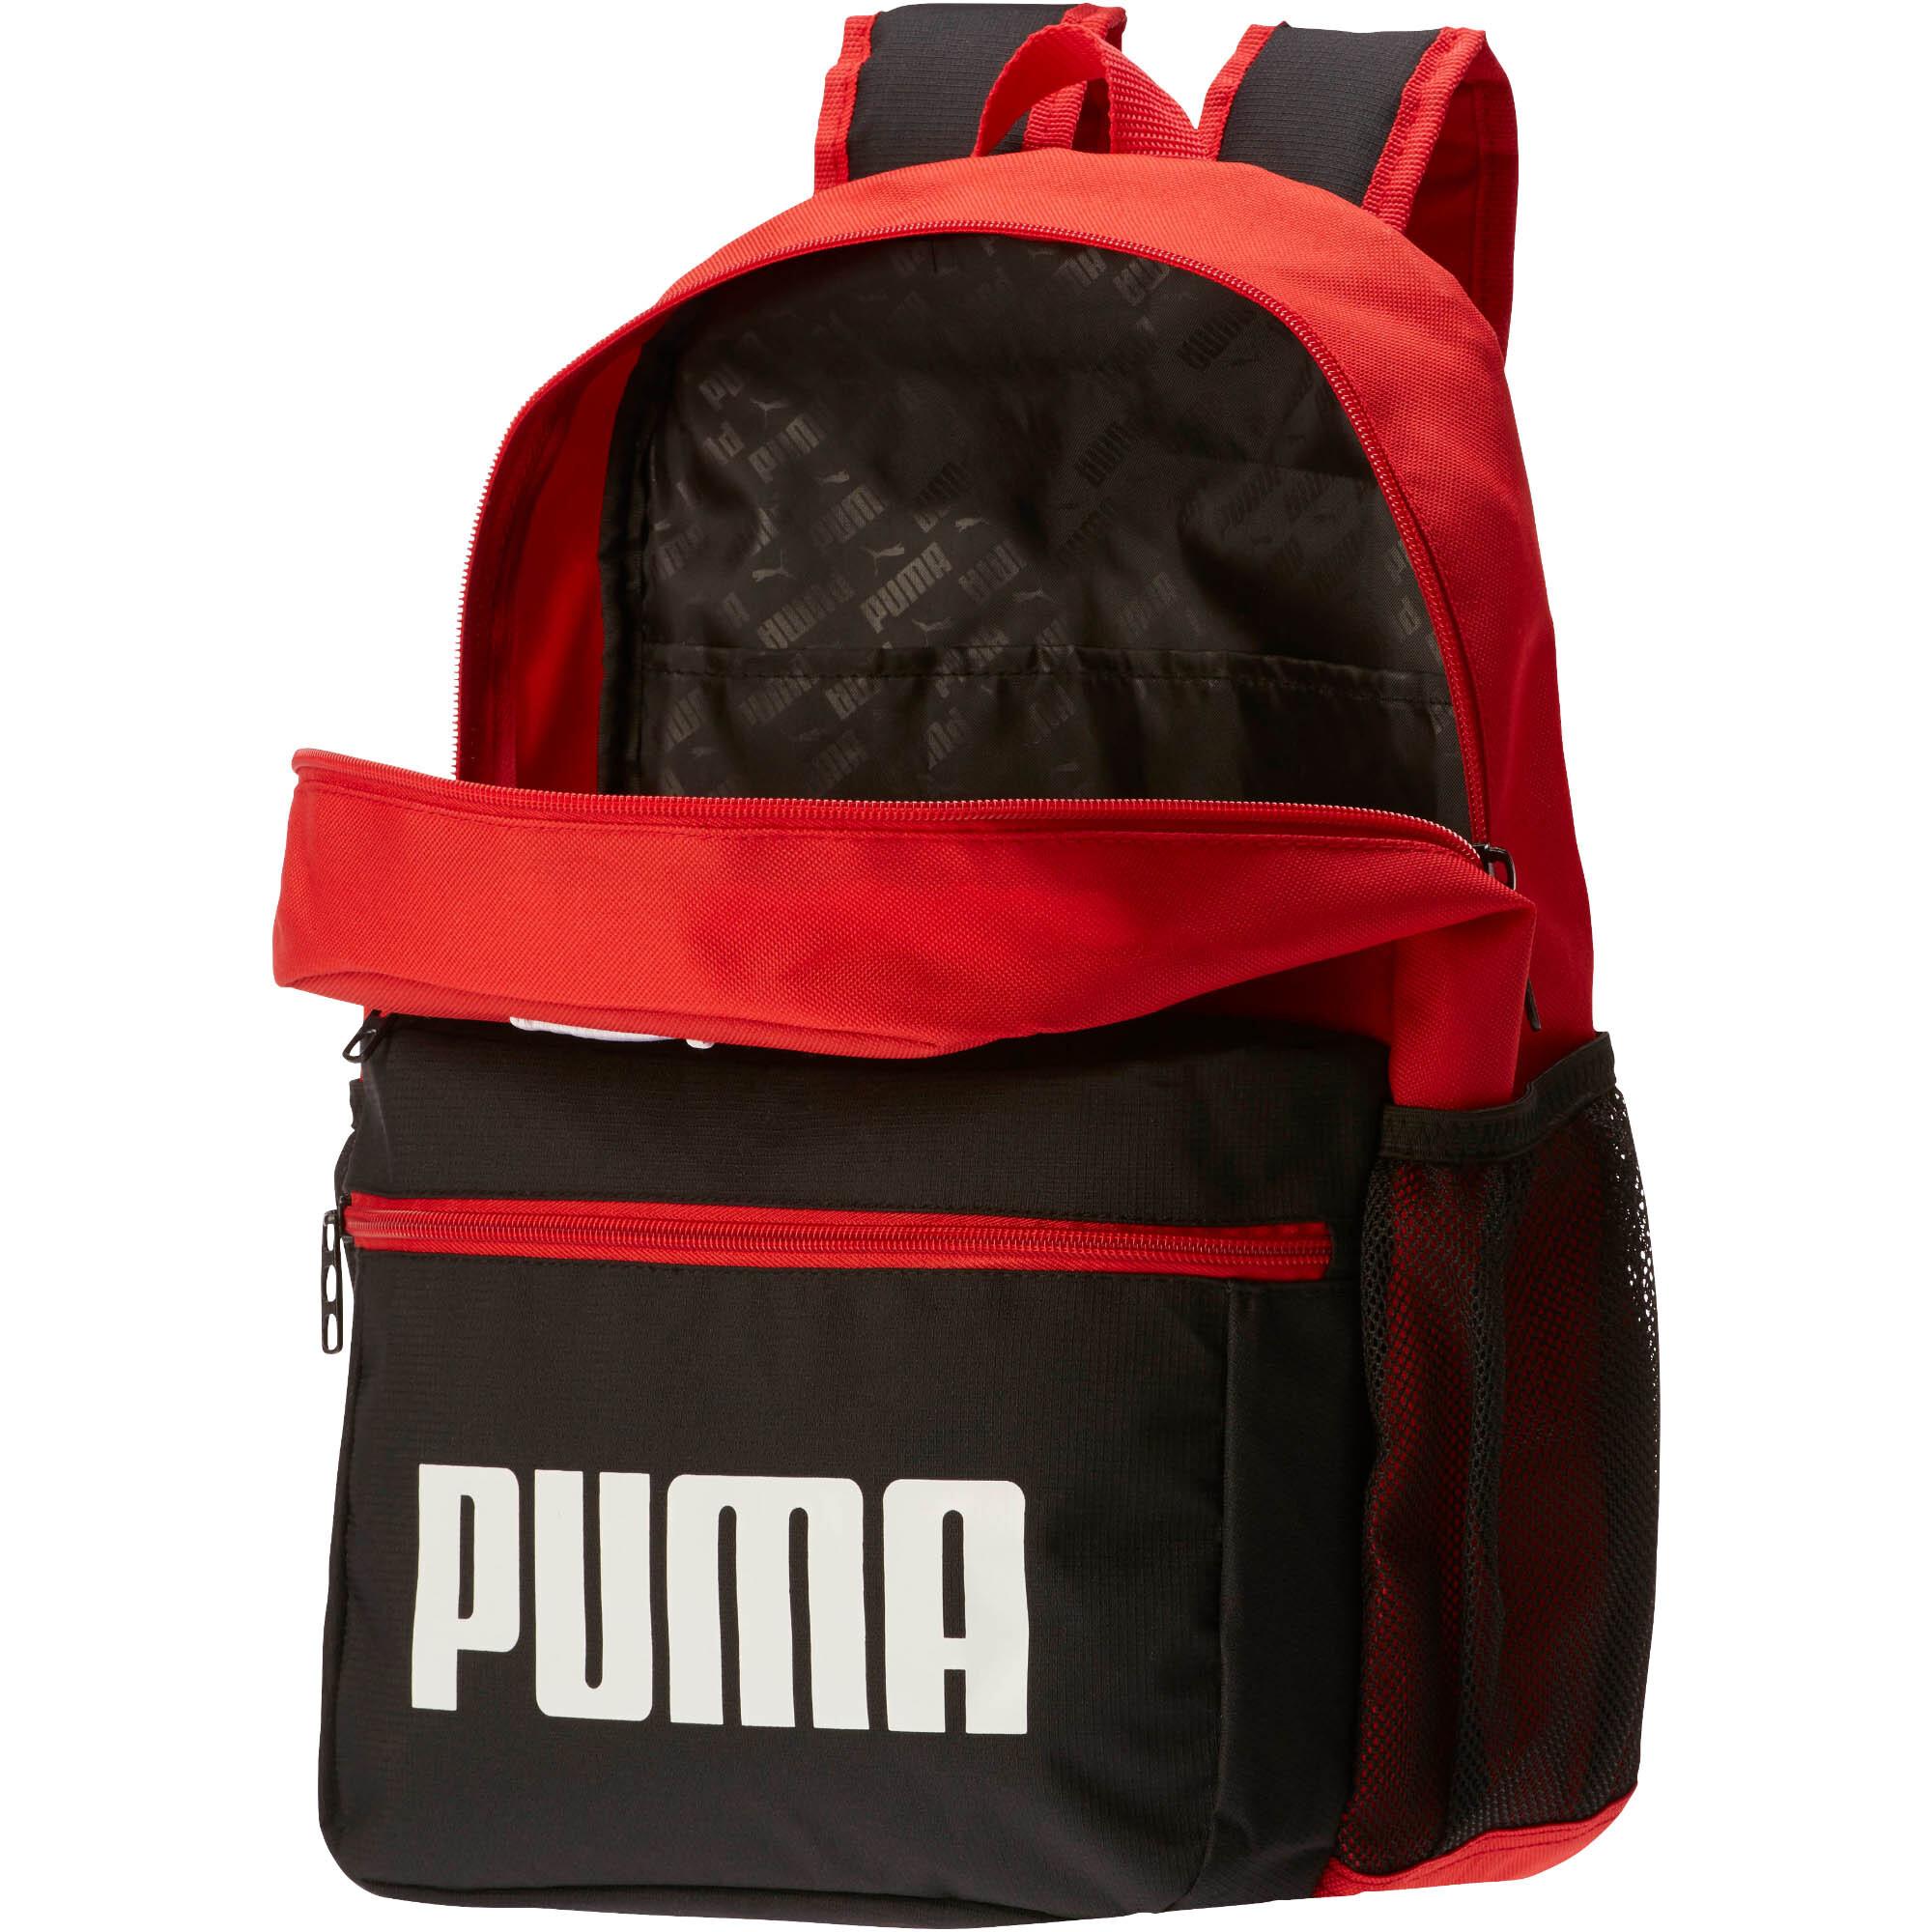 PUMA-Meridian-Kids-039-Backpack-Kids-Backpack thumbnail 4